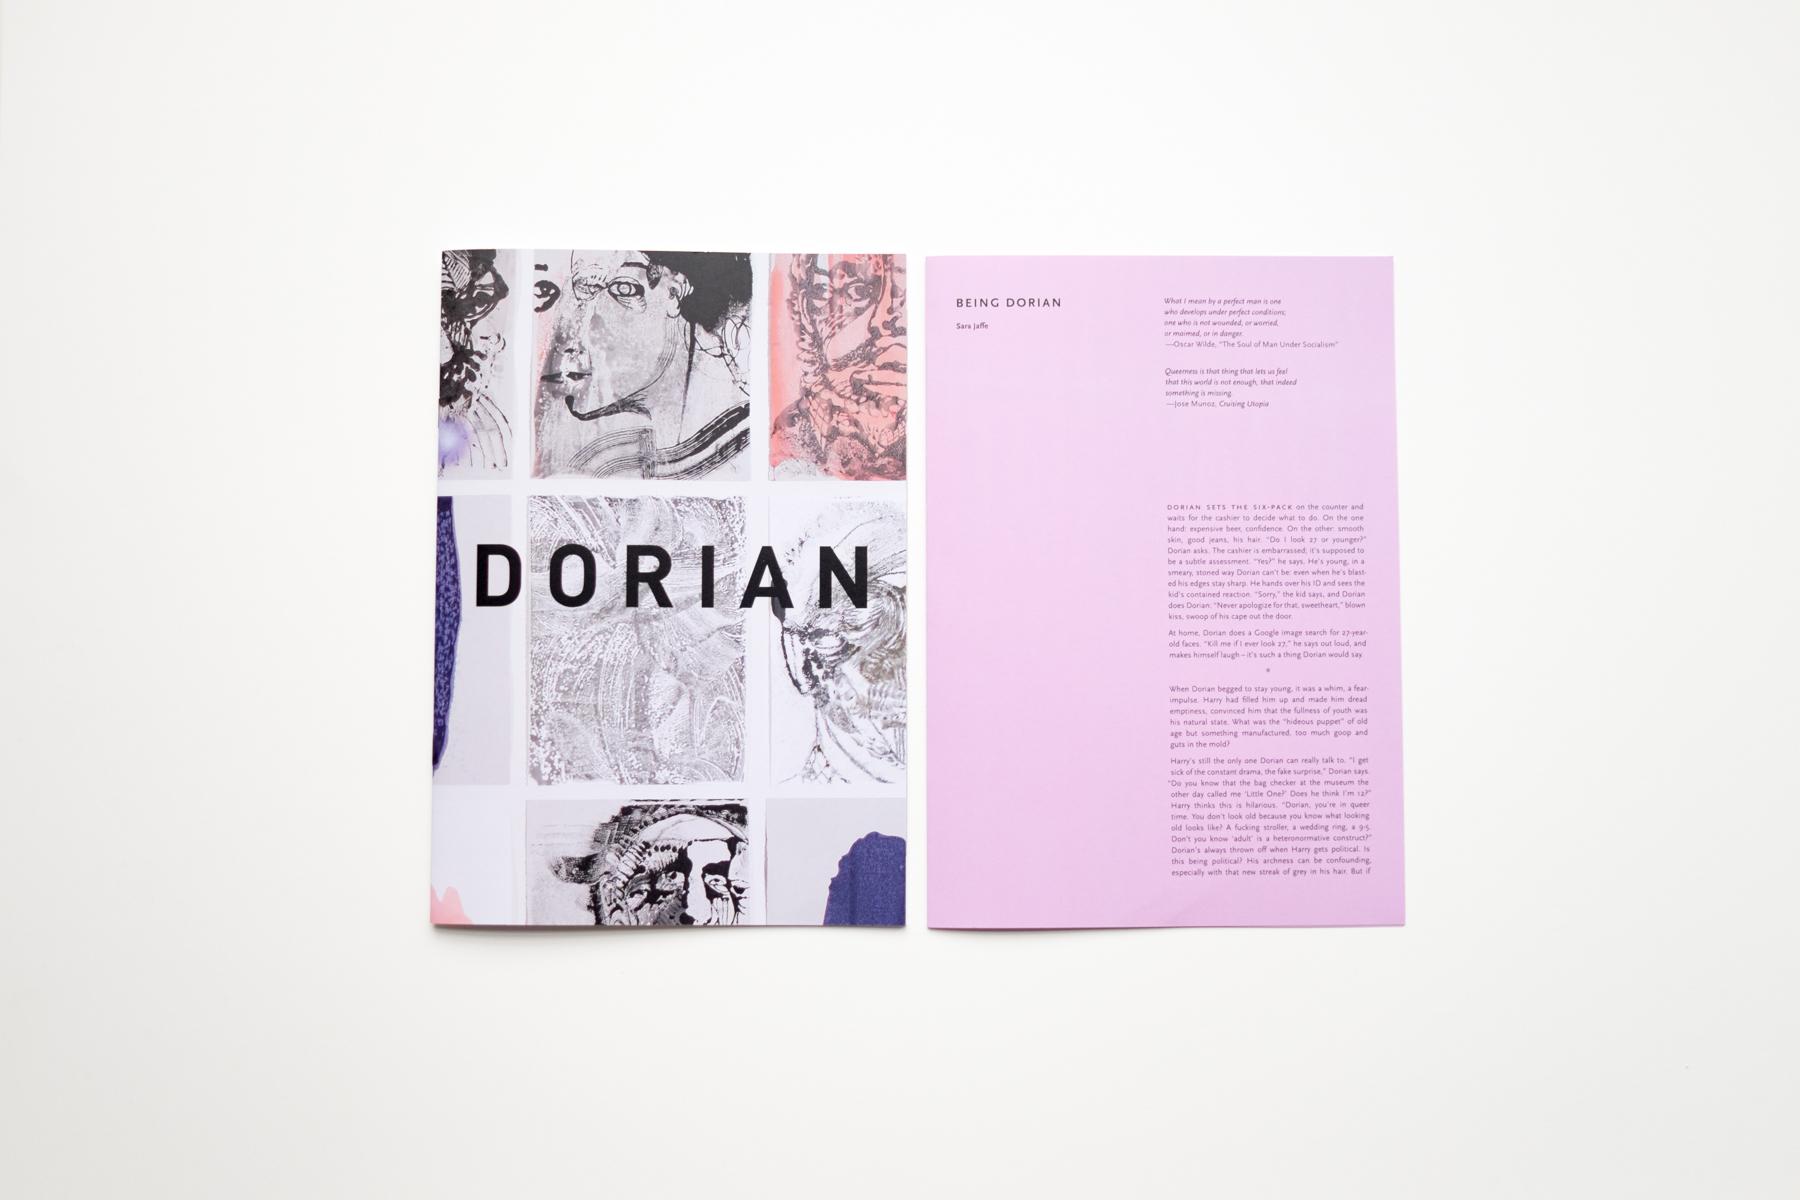 Dorian_Hwatkins-11.jpg